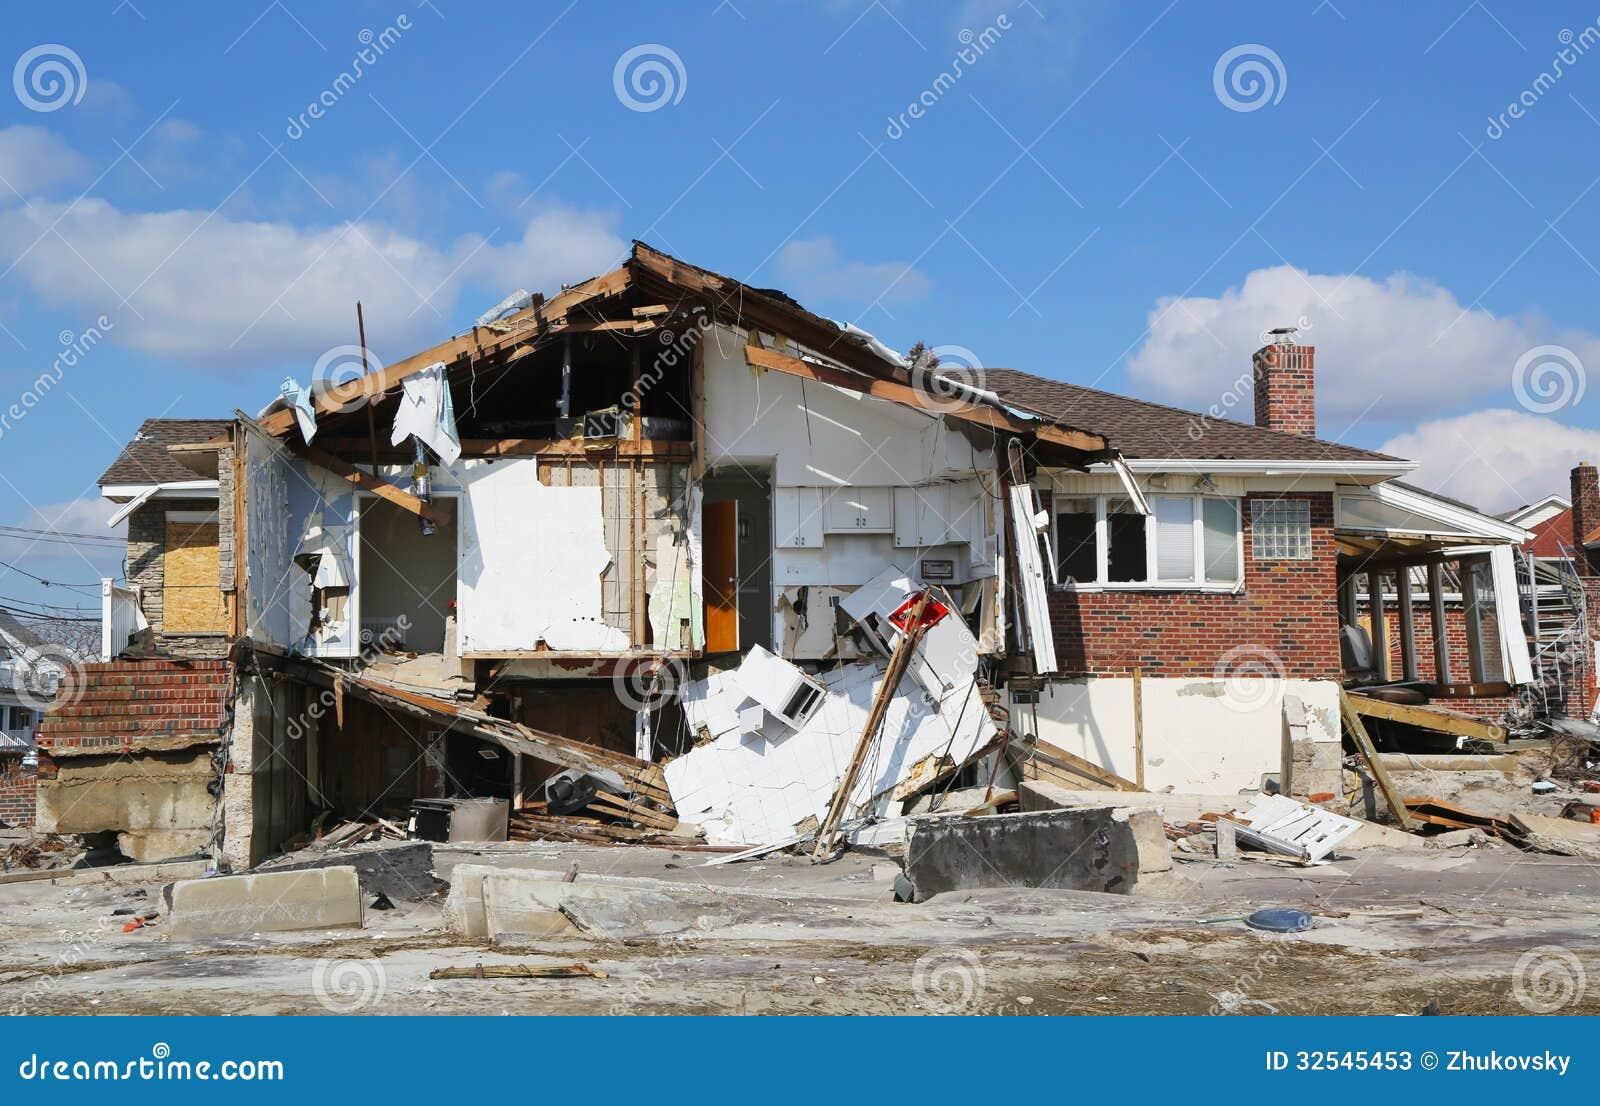 Sandy Building Department